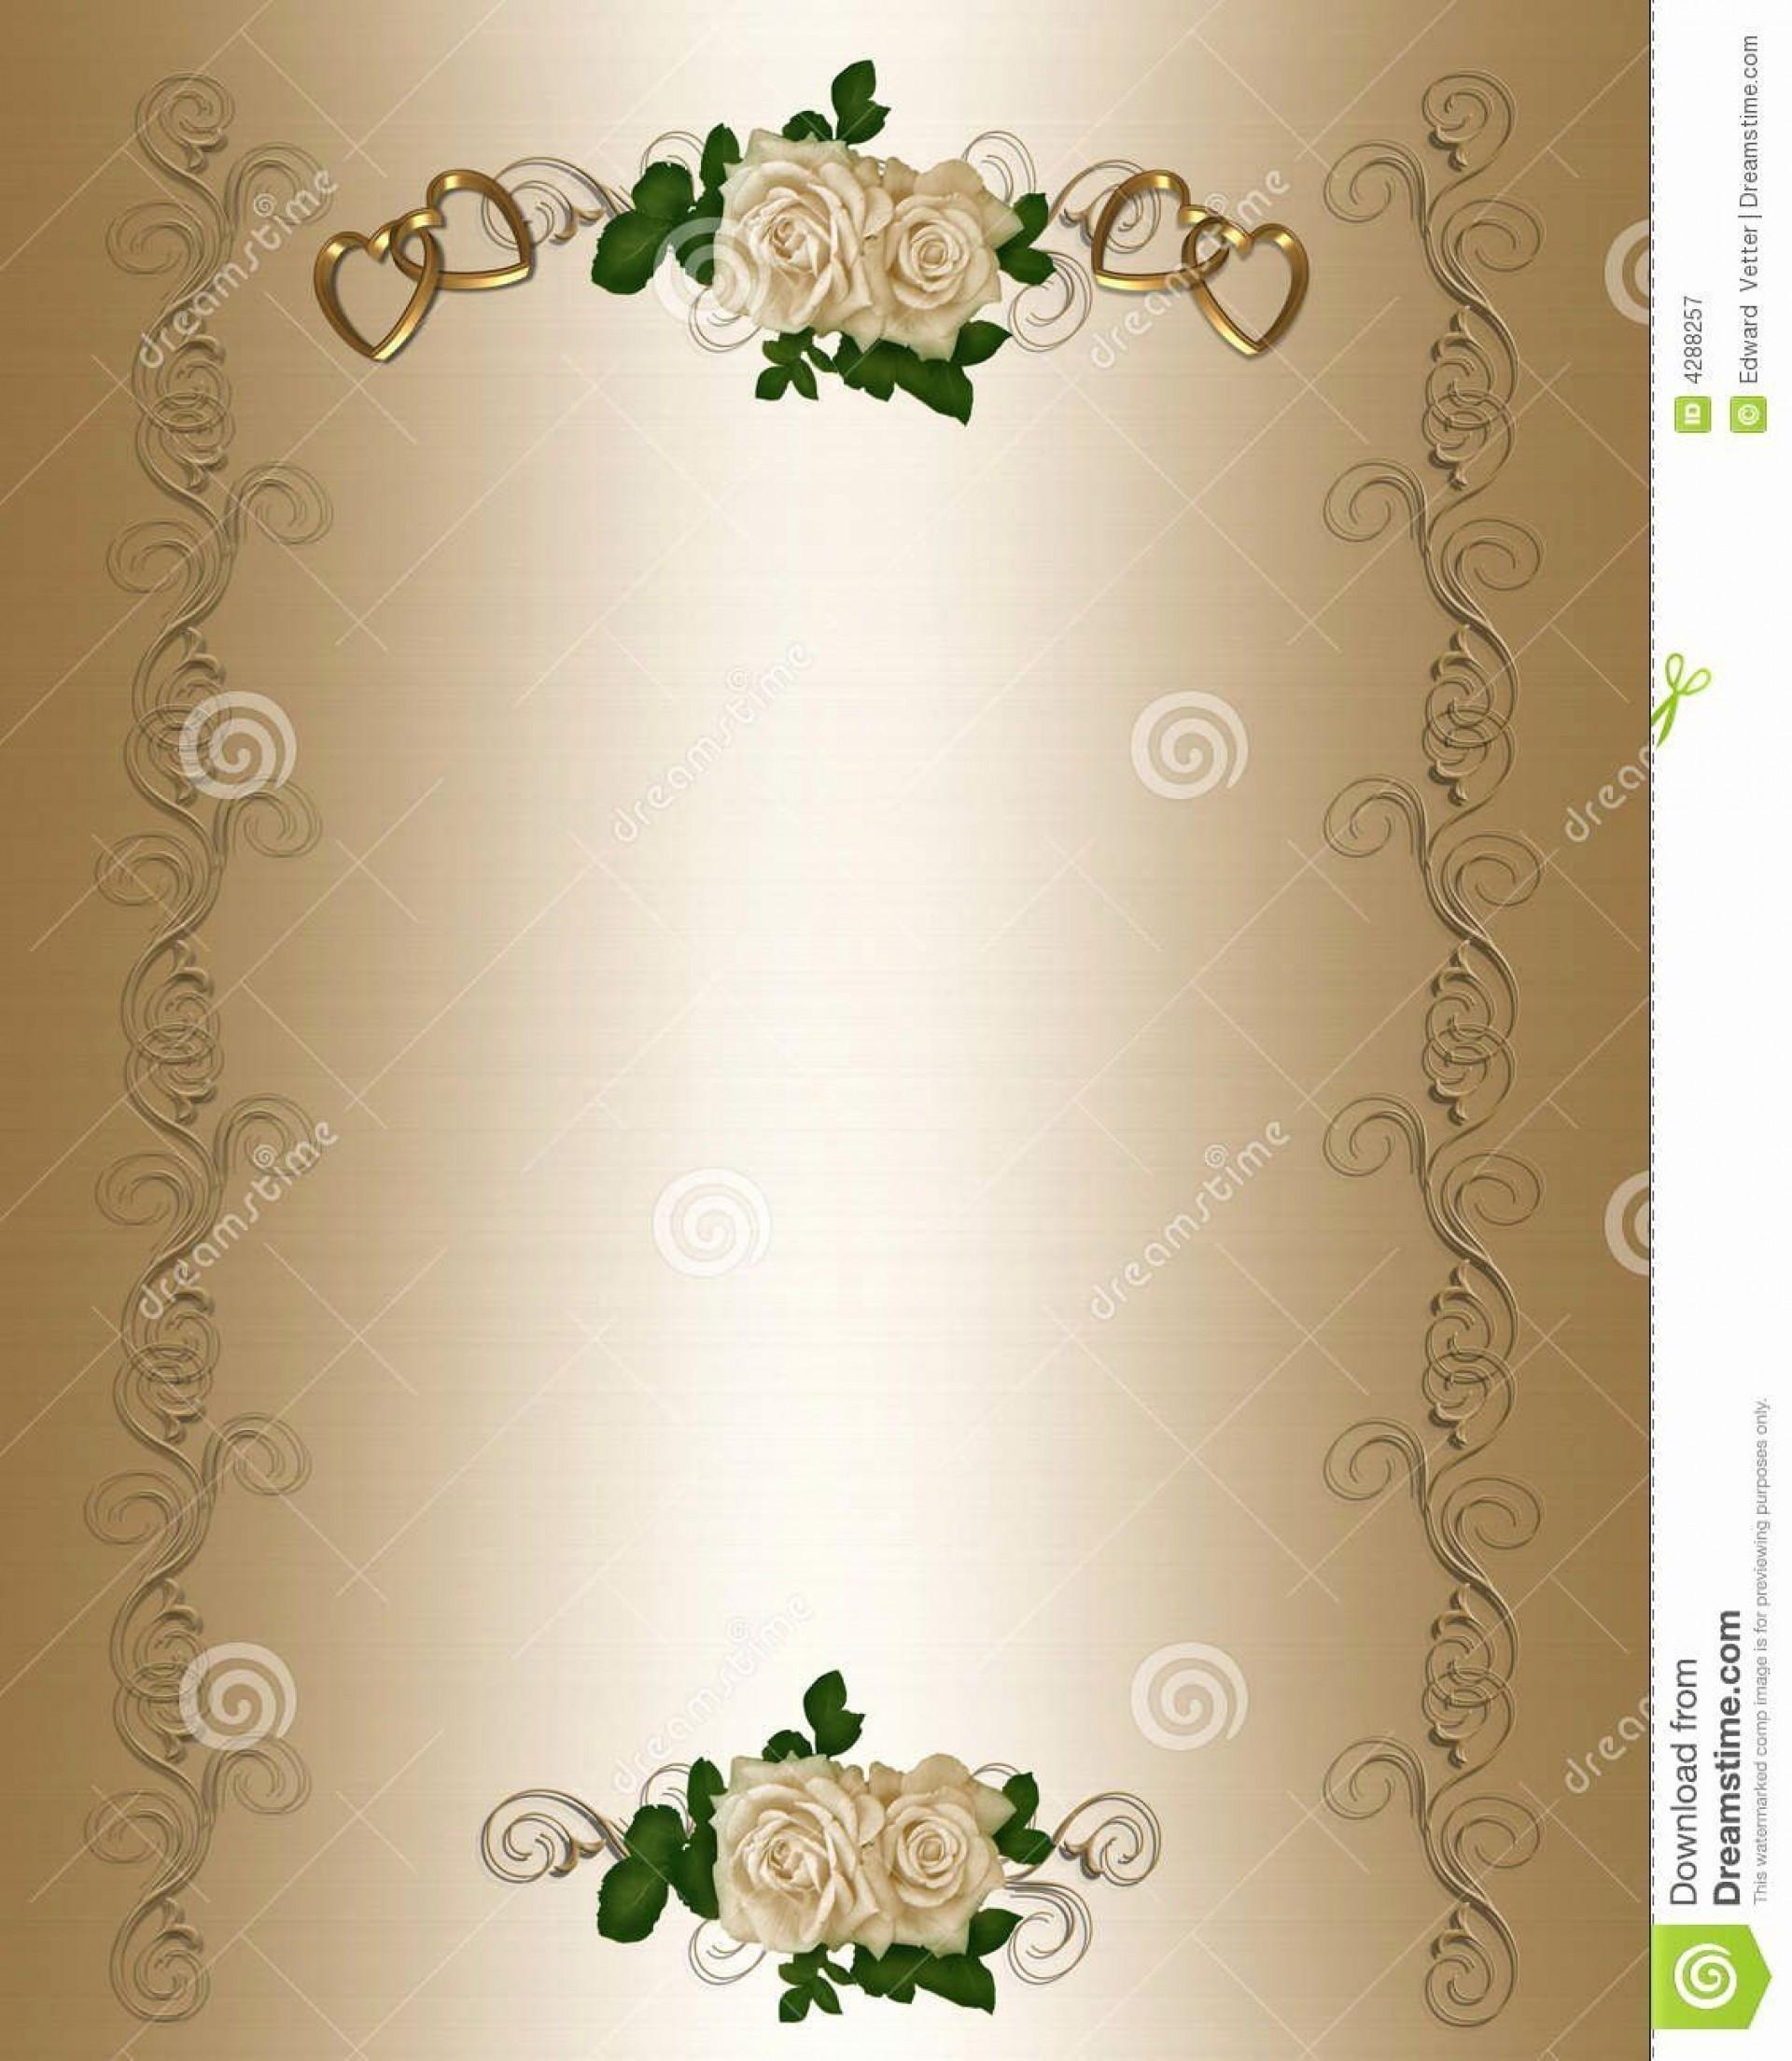 008 Phenomenal 50th Anniversary Invitation Template Free Download High Resolution  Golden Wedding1920